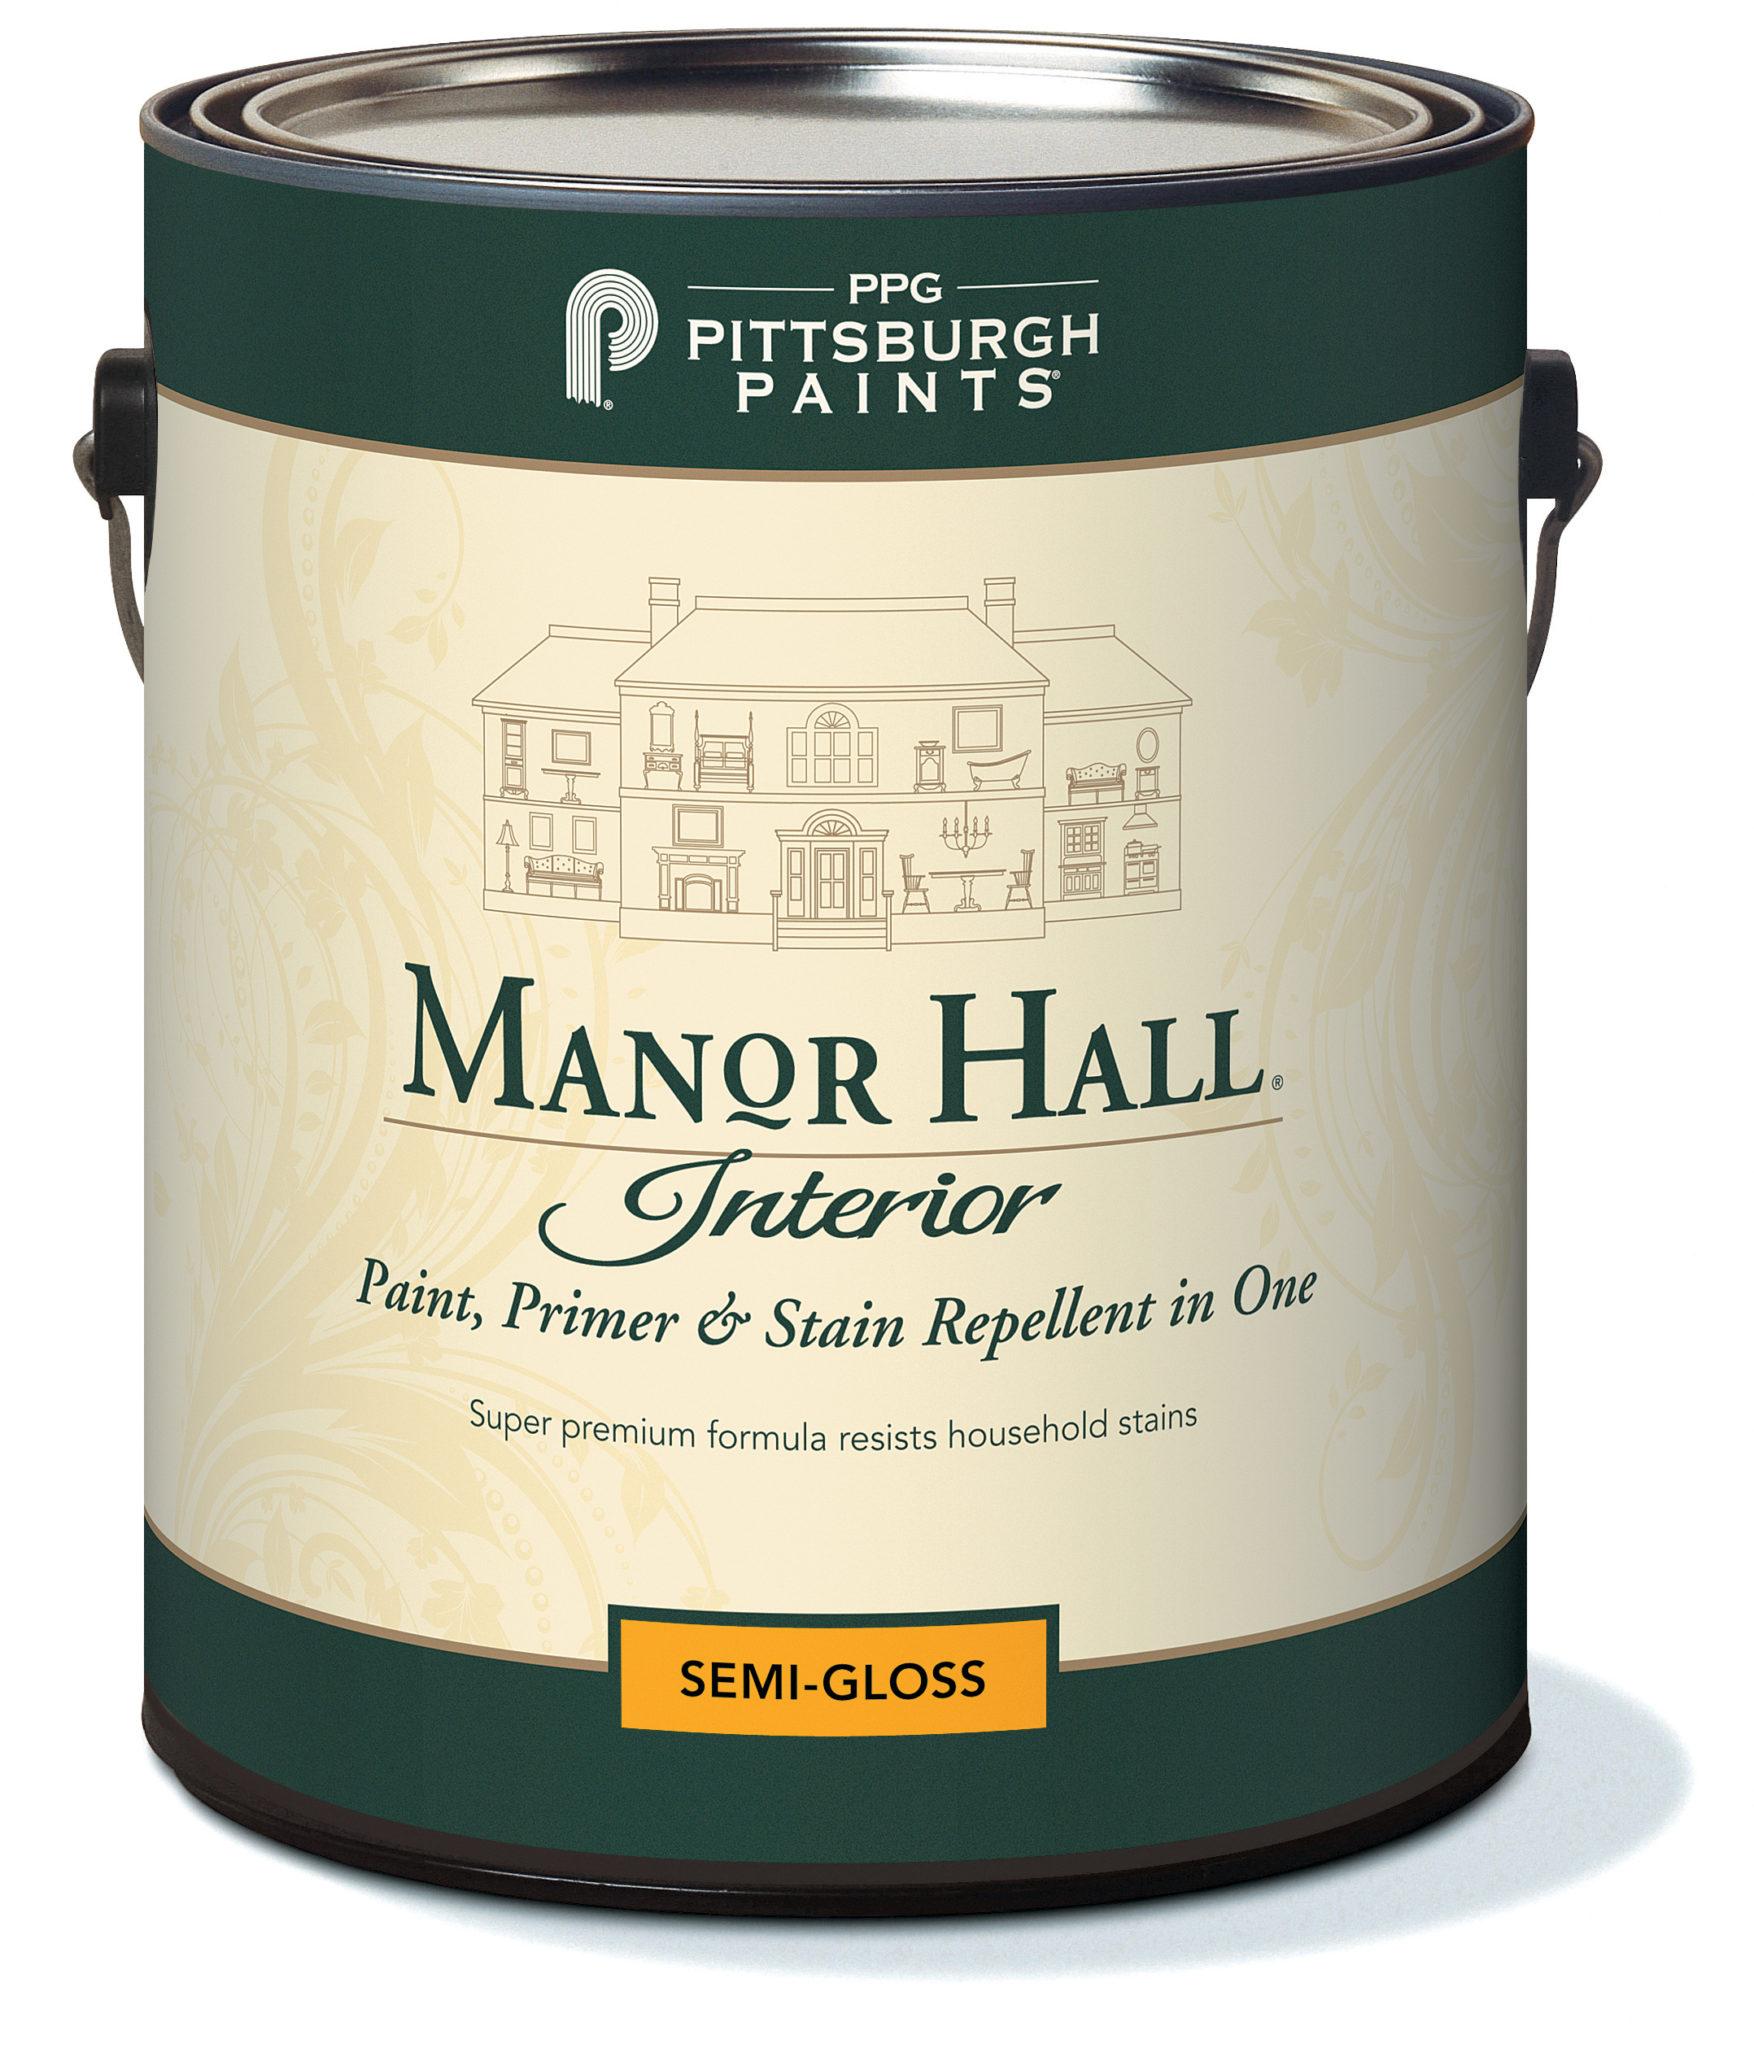 Manor hall interior latex paint semi gloss exclusive paints manor hall interior latex paint semi gloss nvjuhfo Choice Image